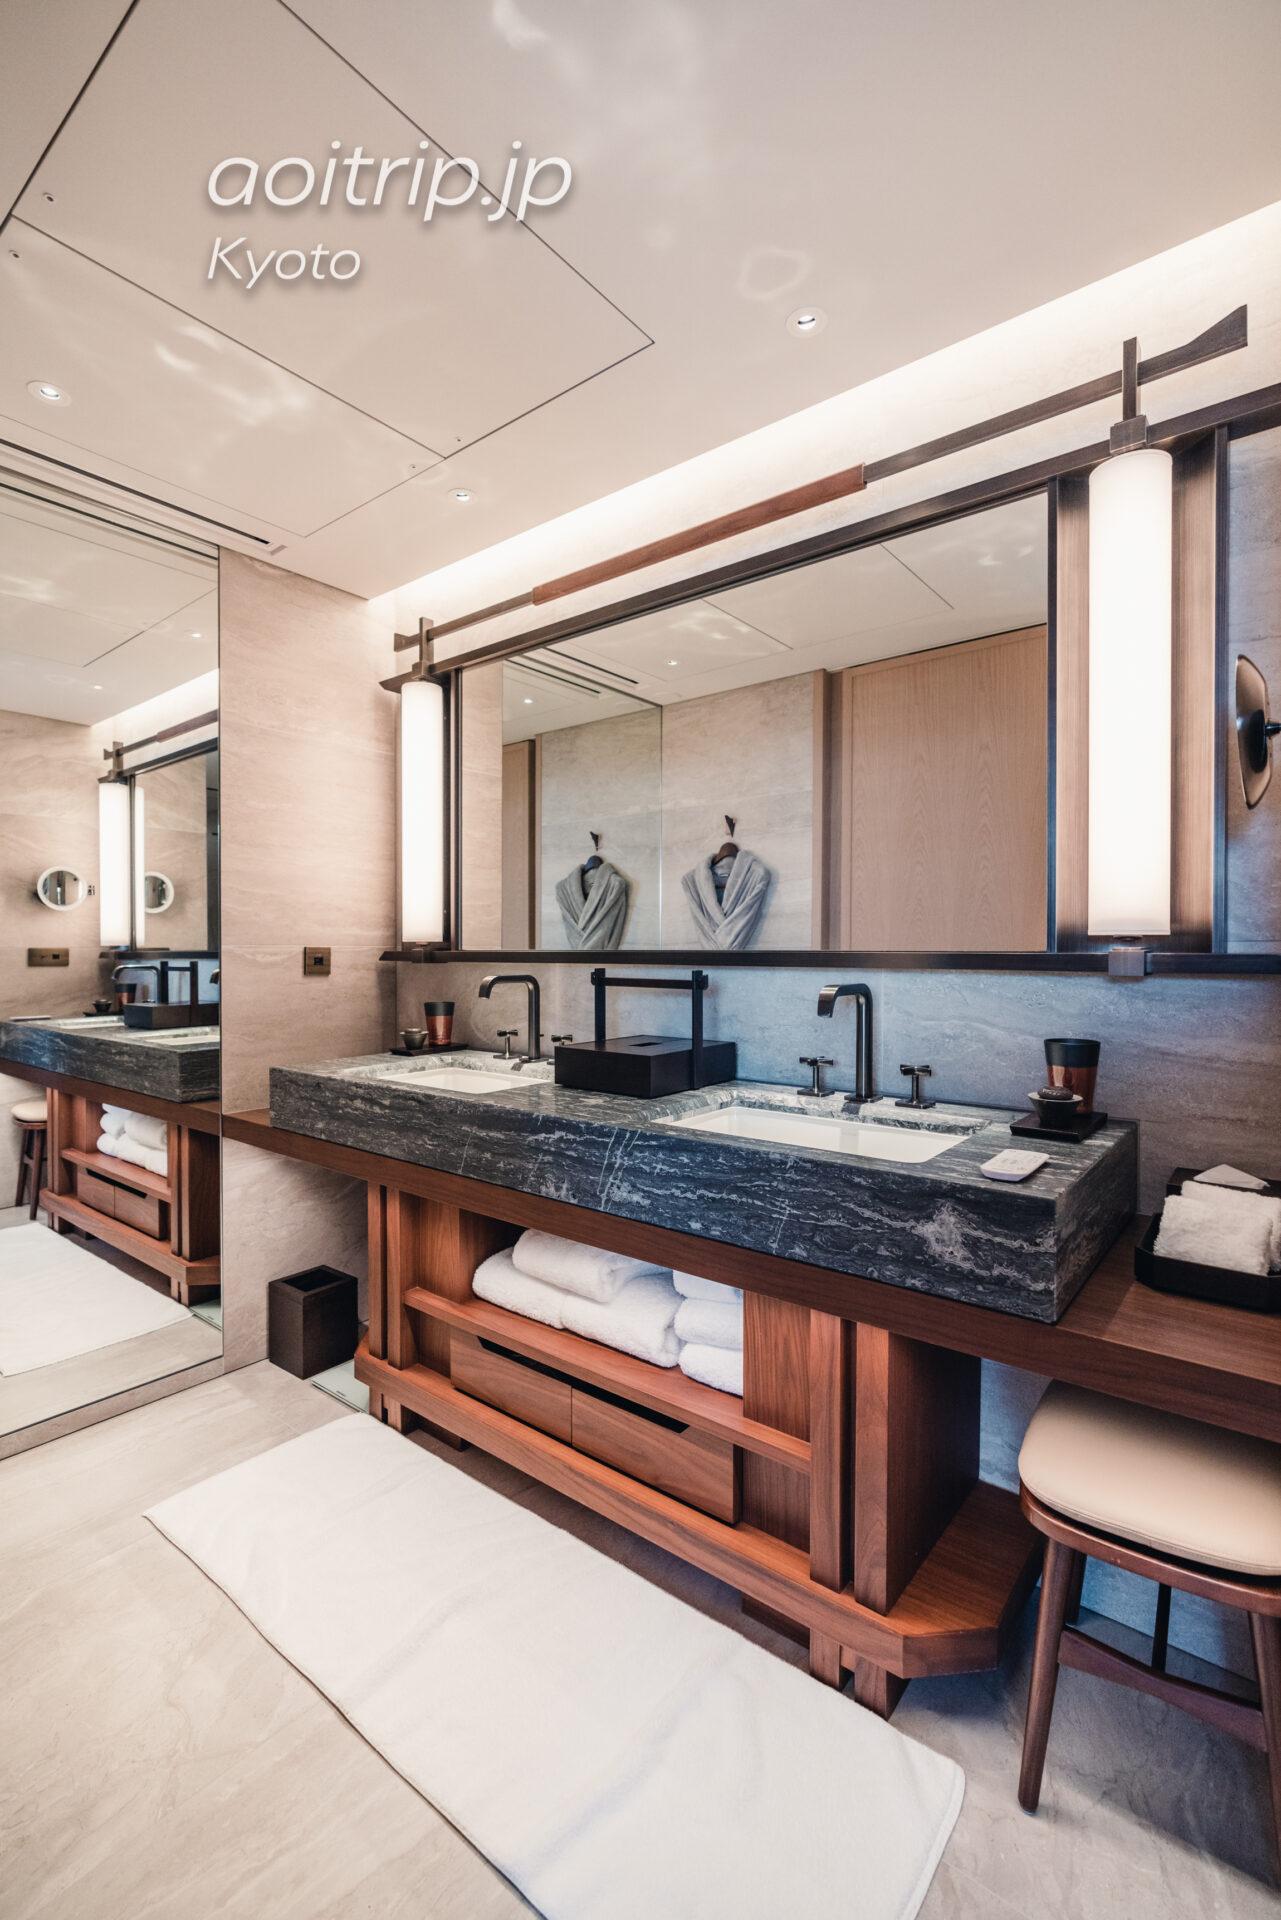 HOTEL THE MITSUI KYOTO デラックススイートの洗面台